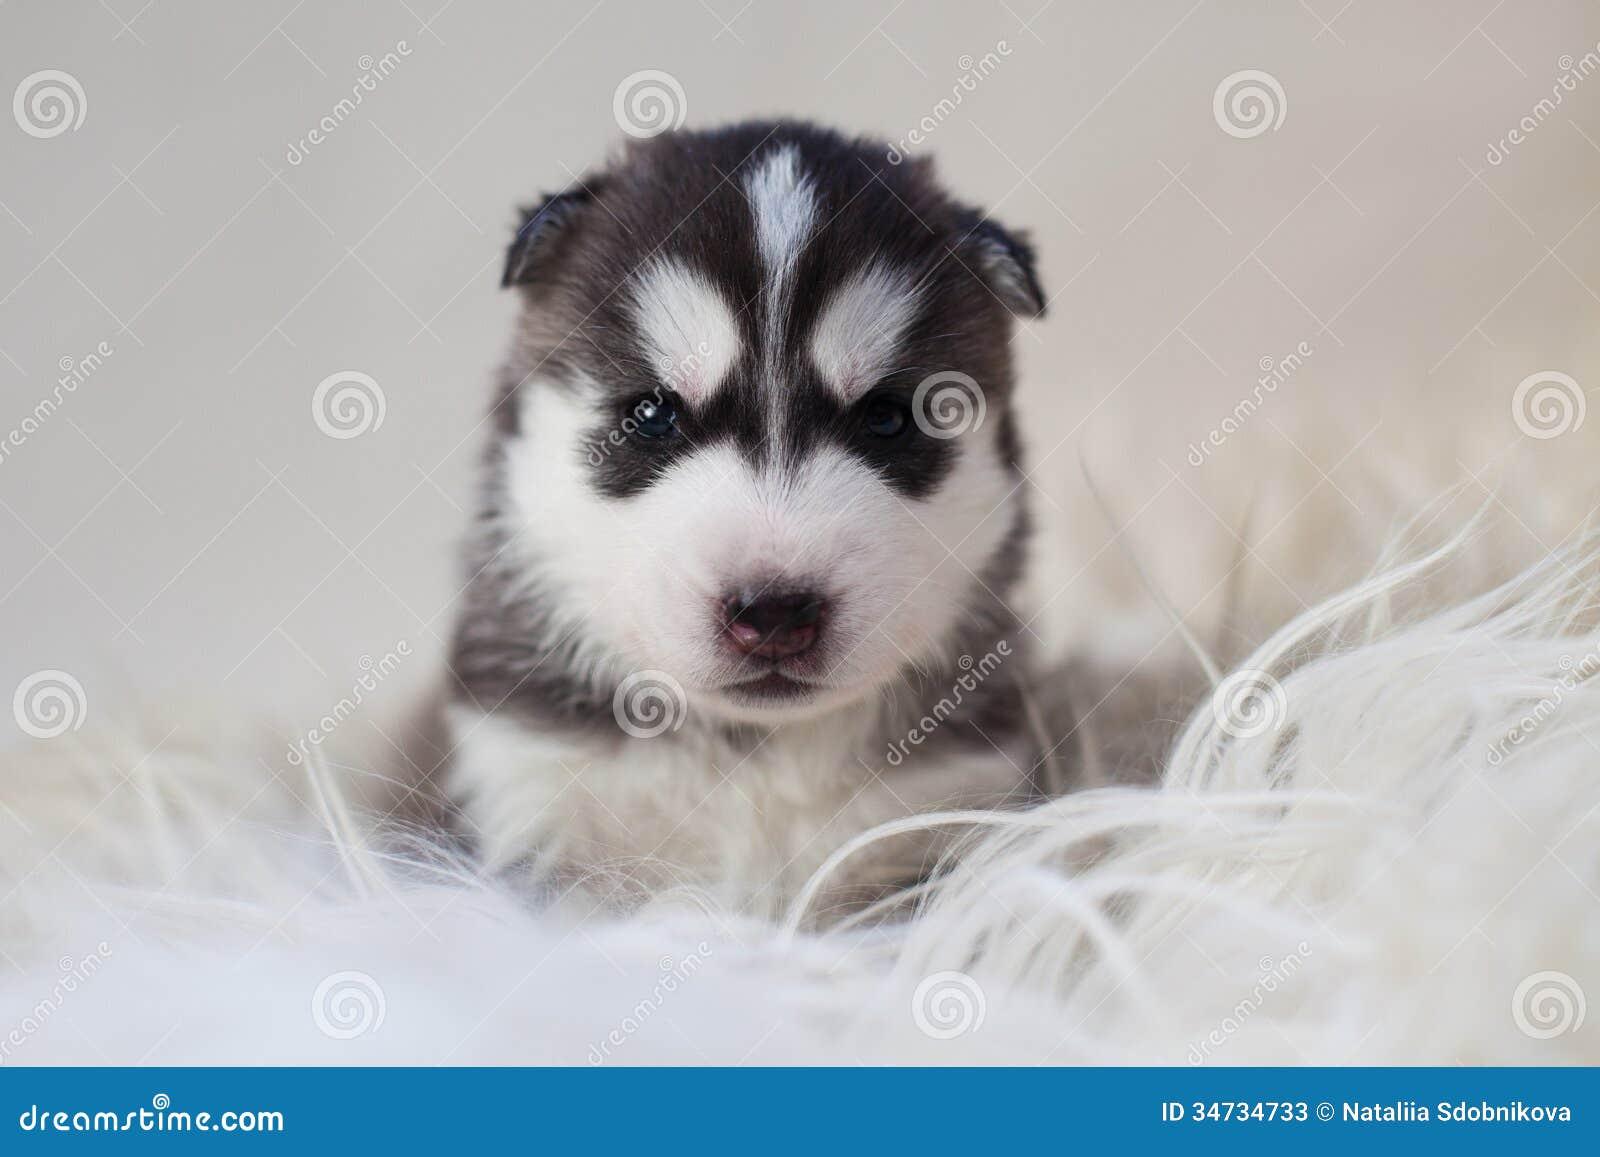 Newborn Puppy Stock Image Image Of Coat Doggy Playful